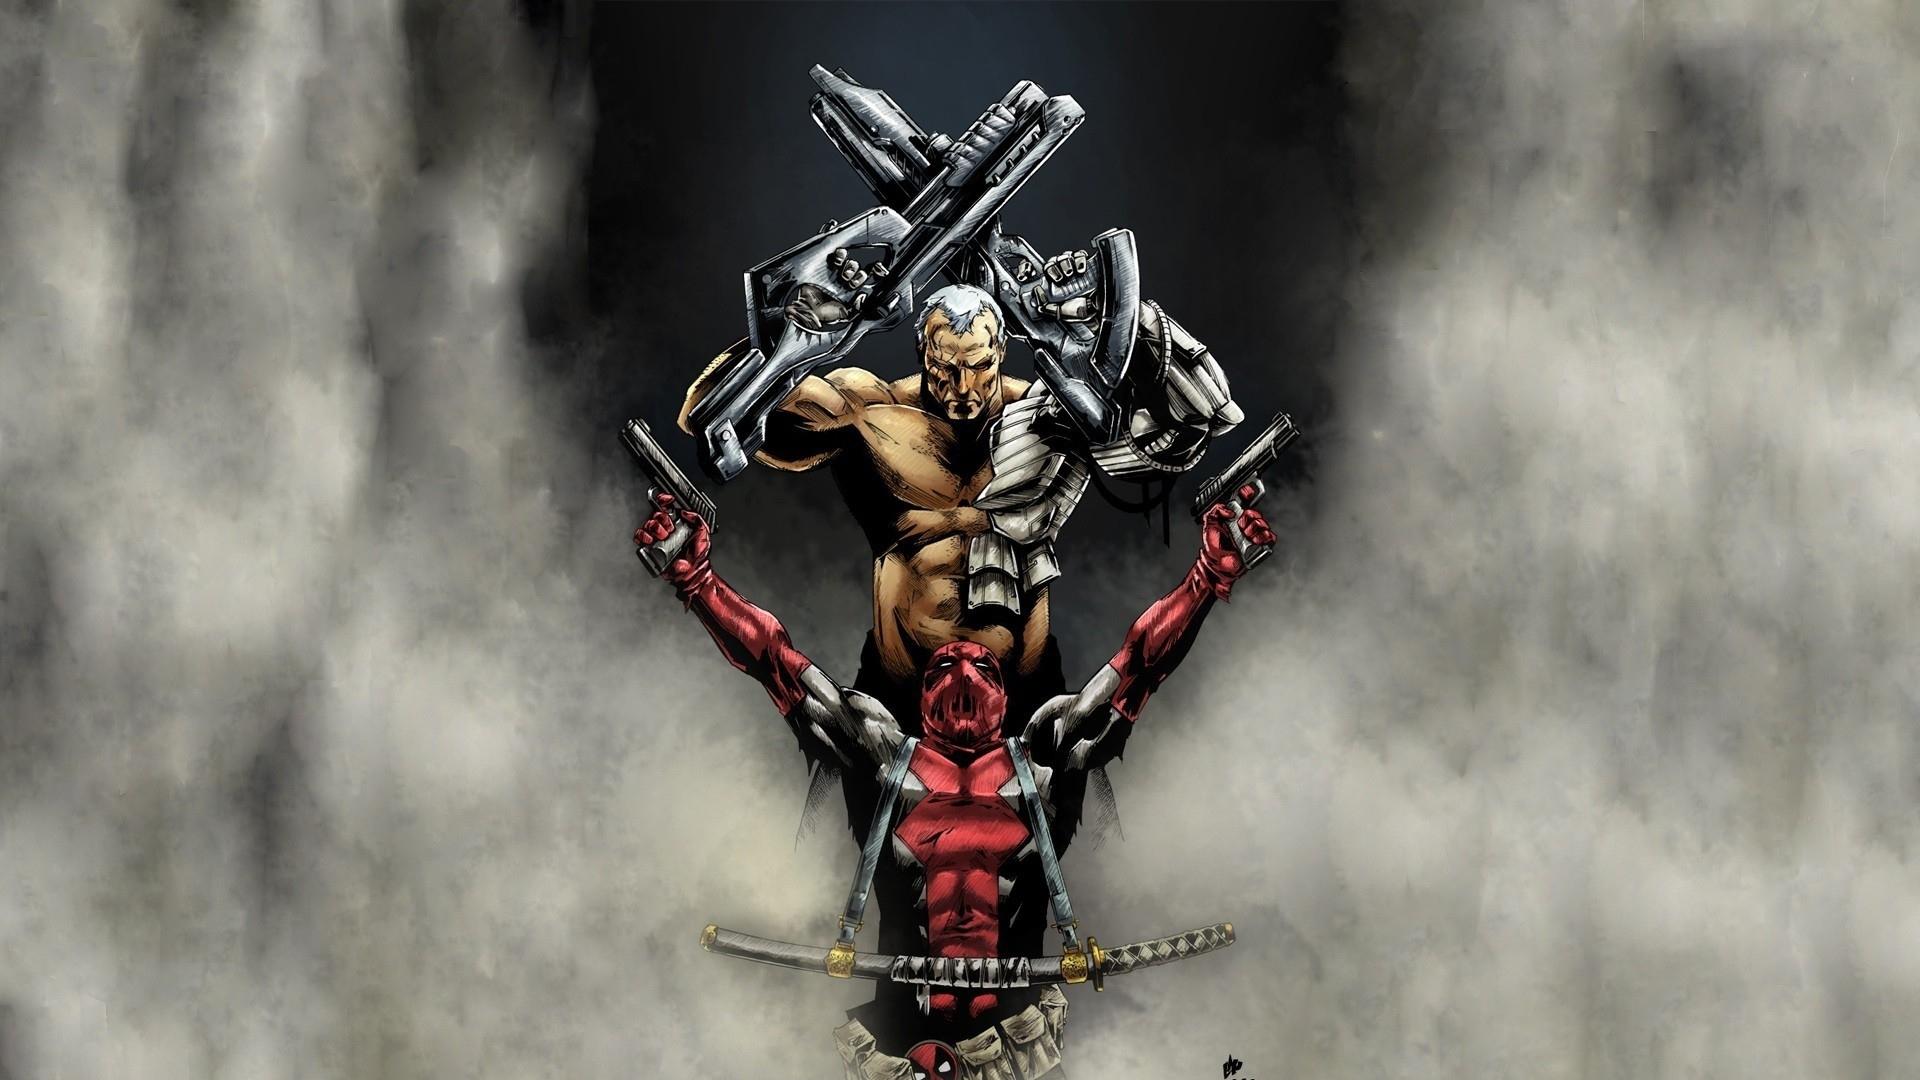 Cable Darme De Deadpool Superheros Spiderman Fond Decran